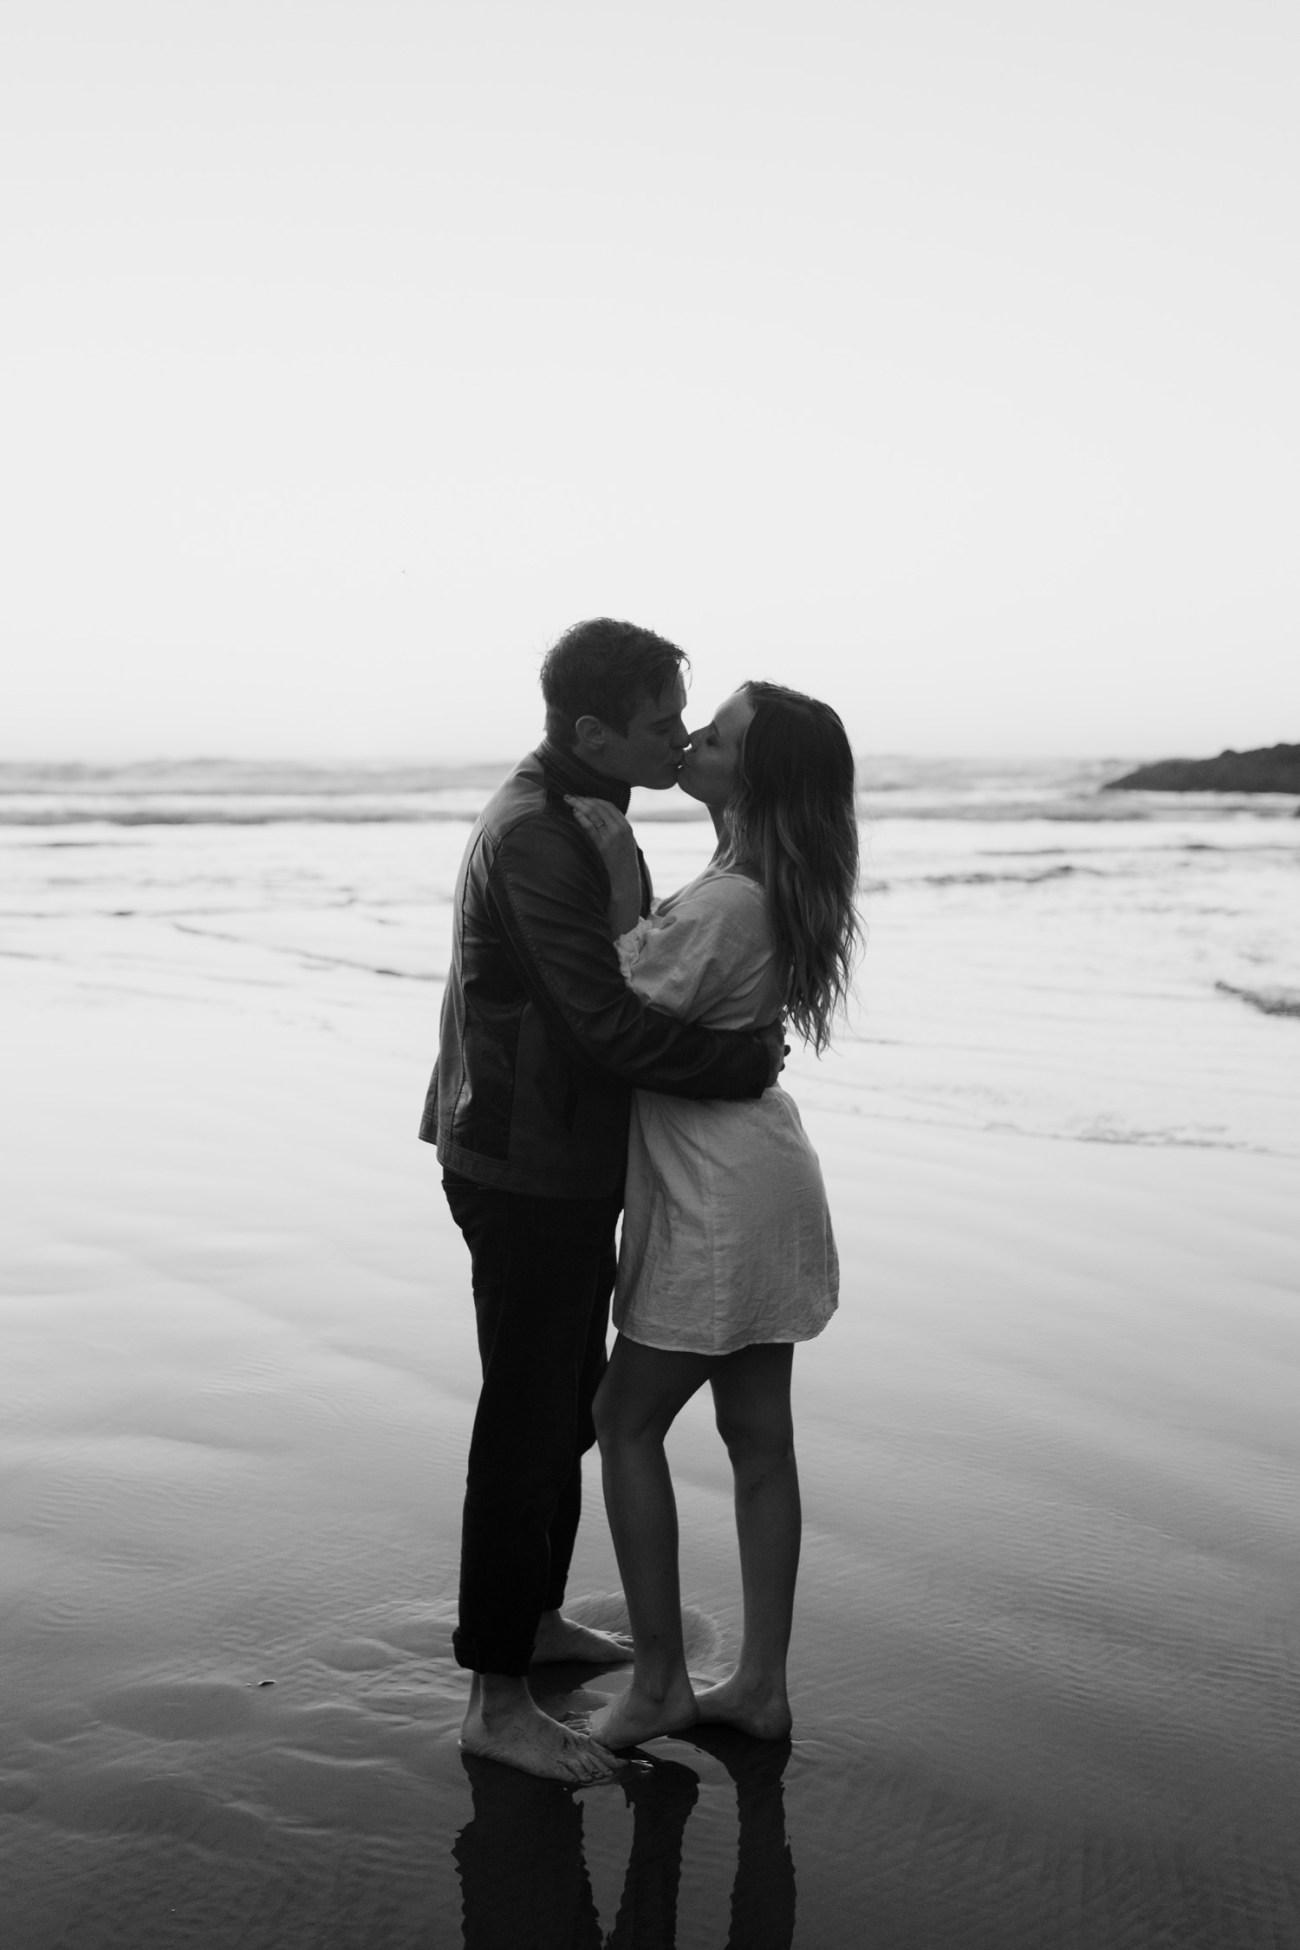 Yachats Oregon Coast Cape Perpetua Engagement Session Bend Wedding Photographer Anais Possamai Photography 045